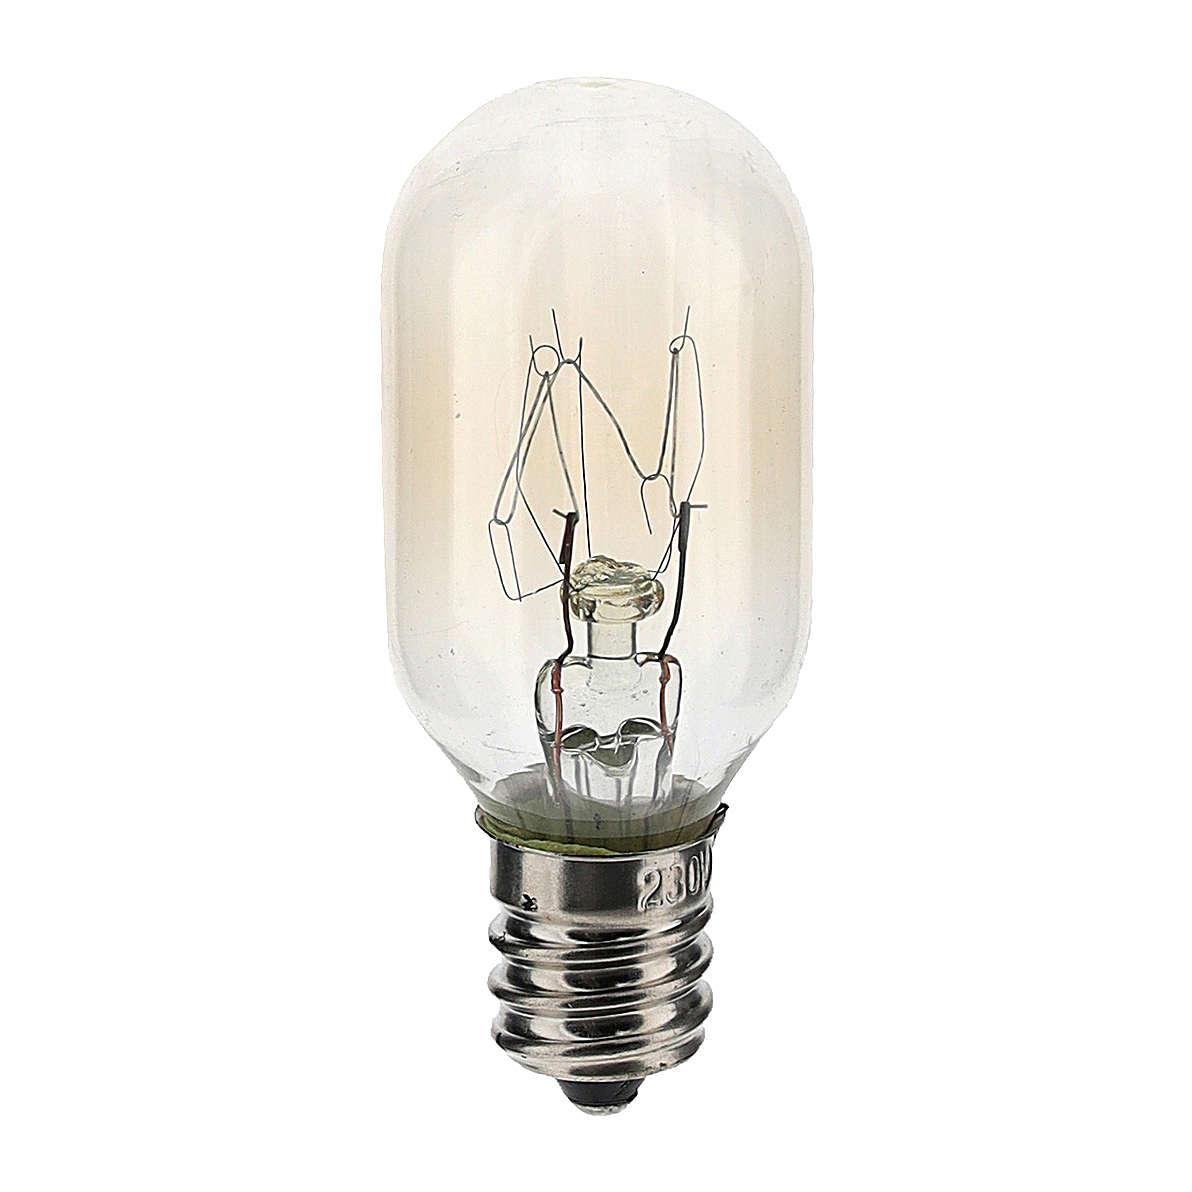 Lampadina 3 lumen 220V E12 1,5W 4